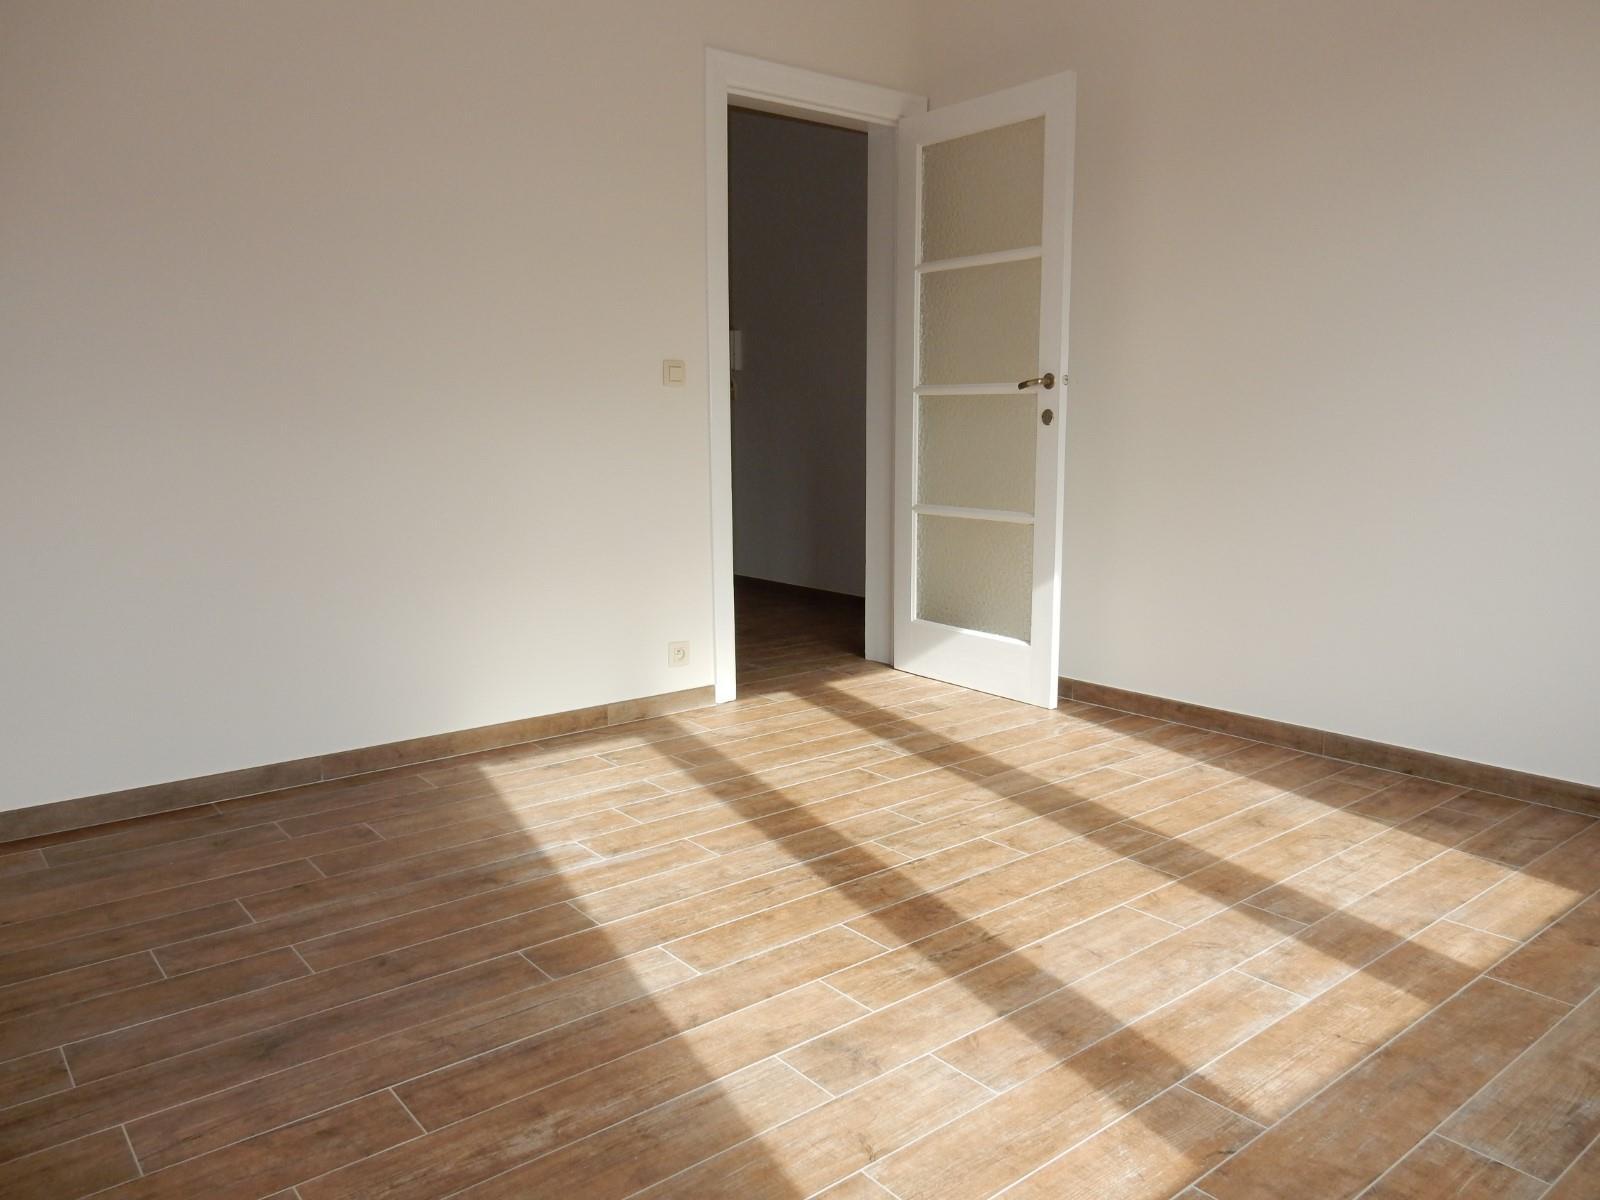 Appartement - Molenbeek-Saint-Jean - #3532282-6